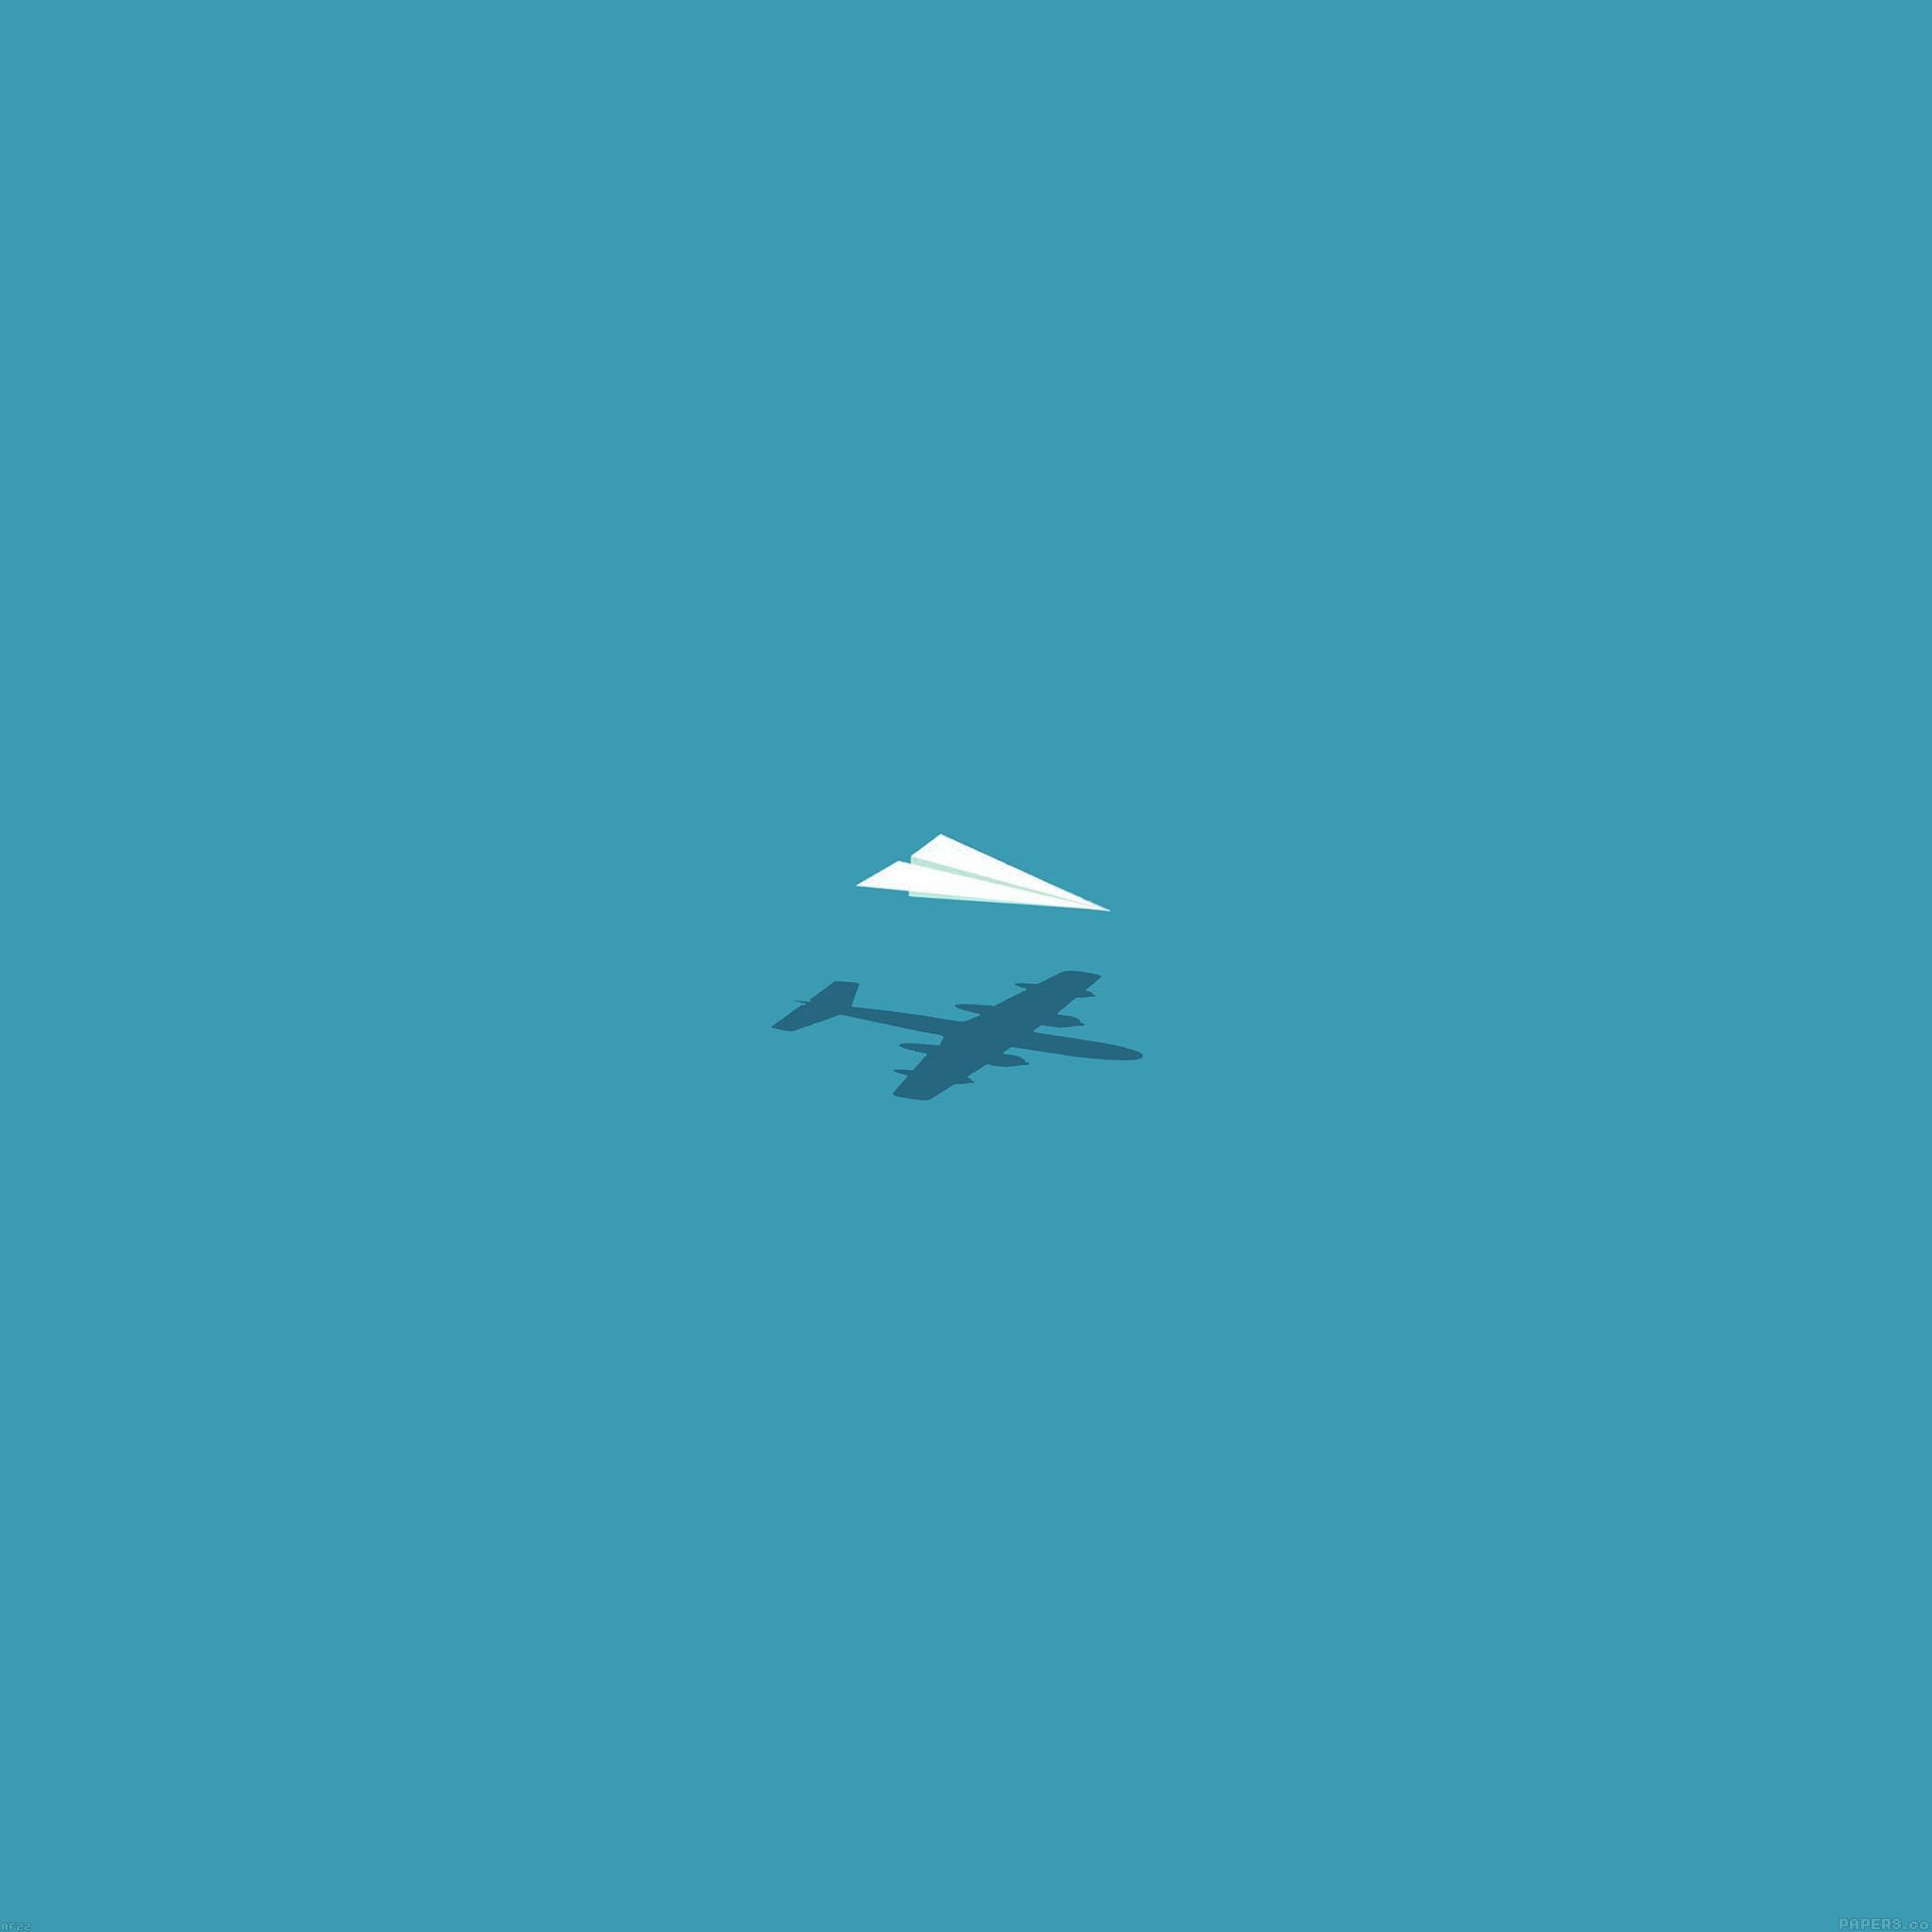 af22-rc-plane-minimal-blue-art-illust-cute - Papers.co